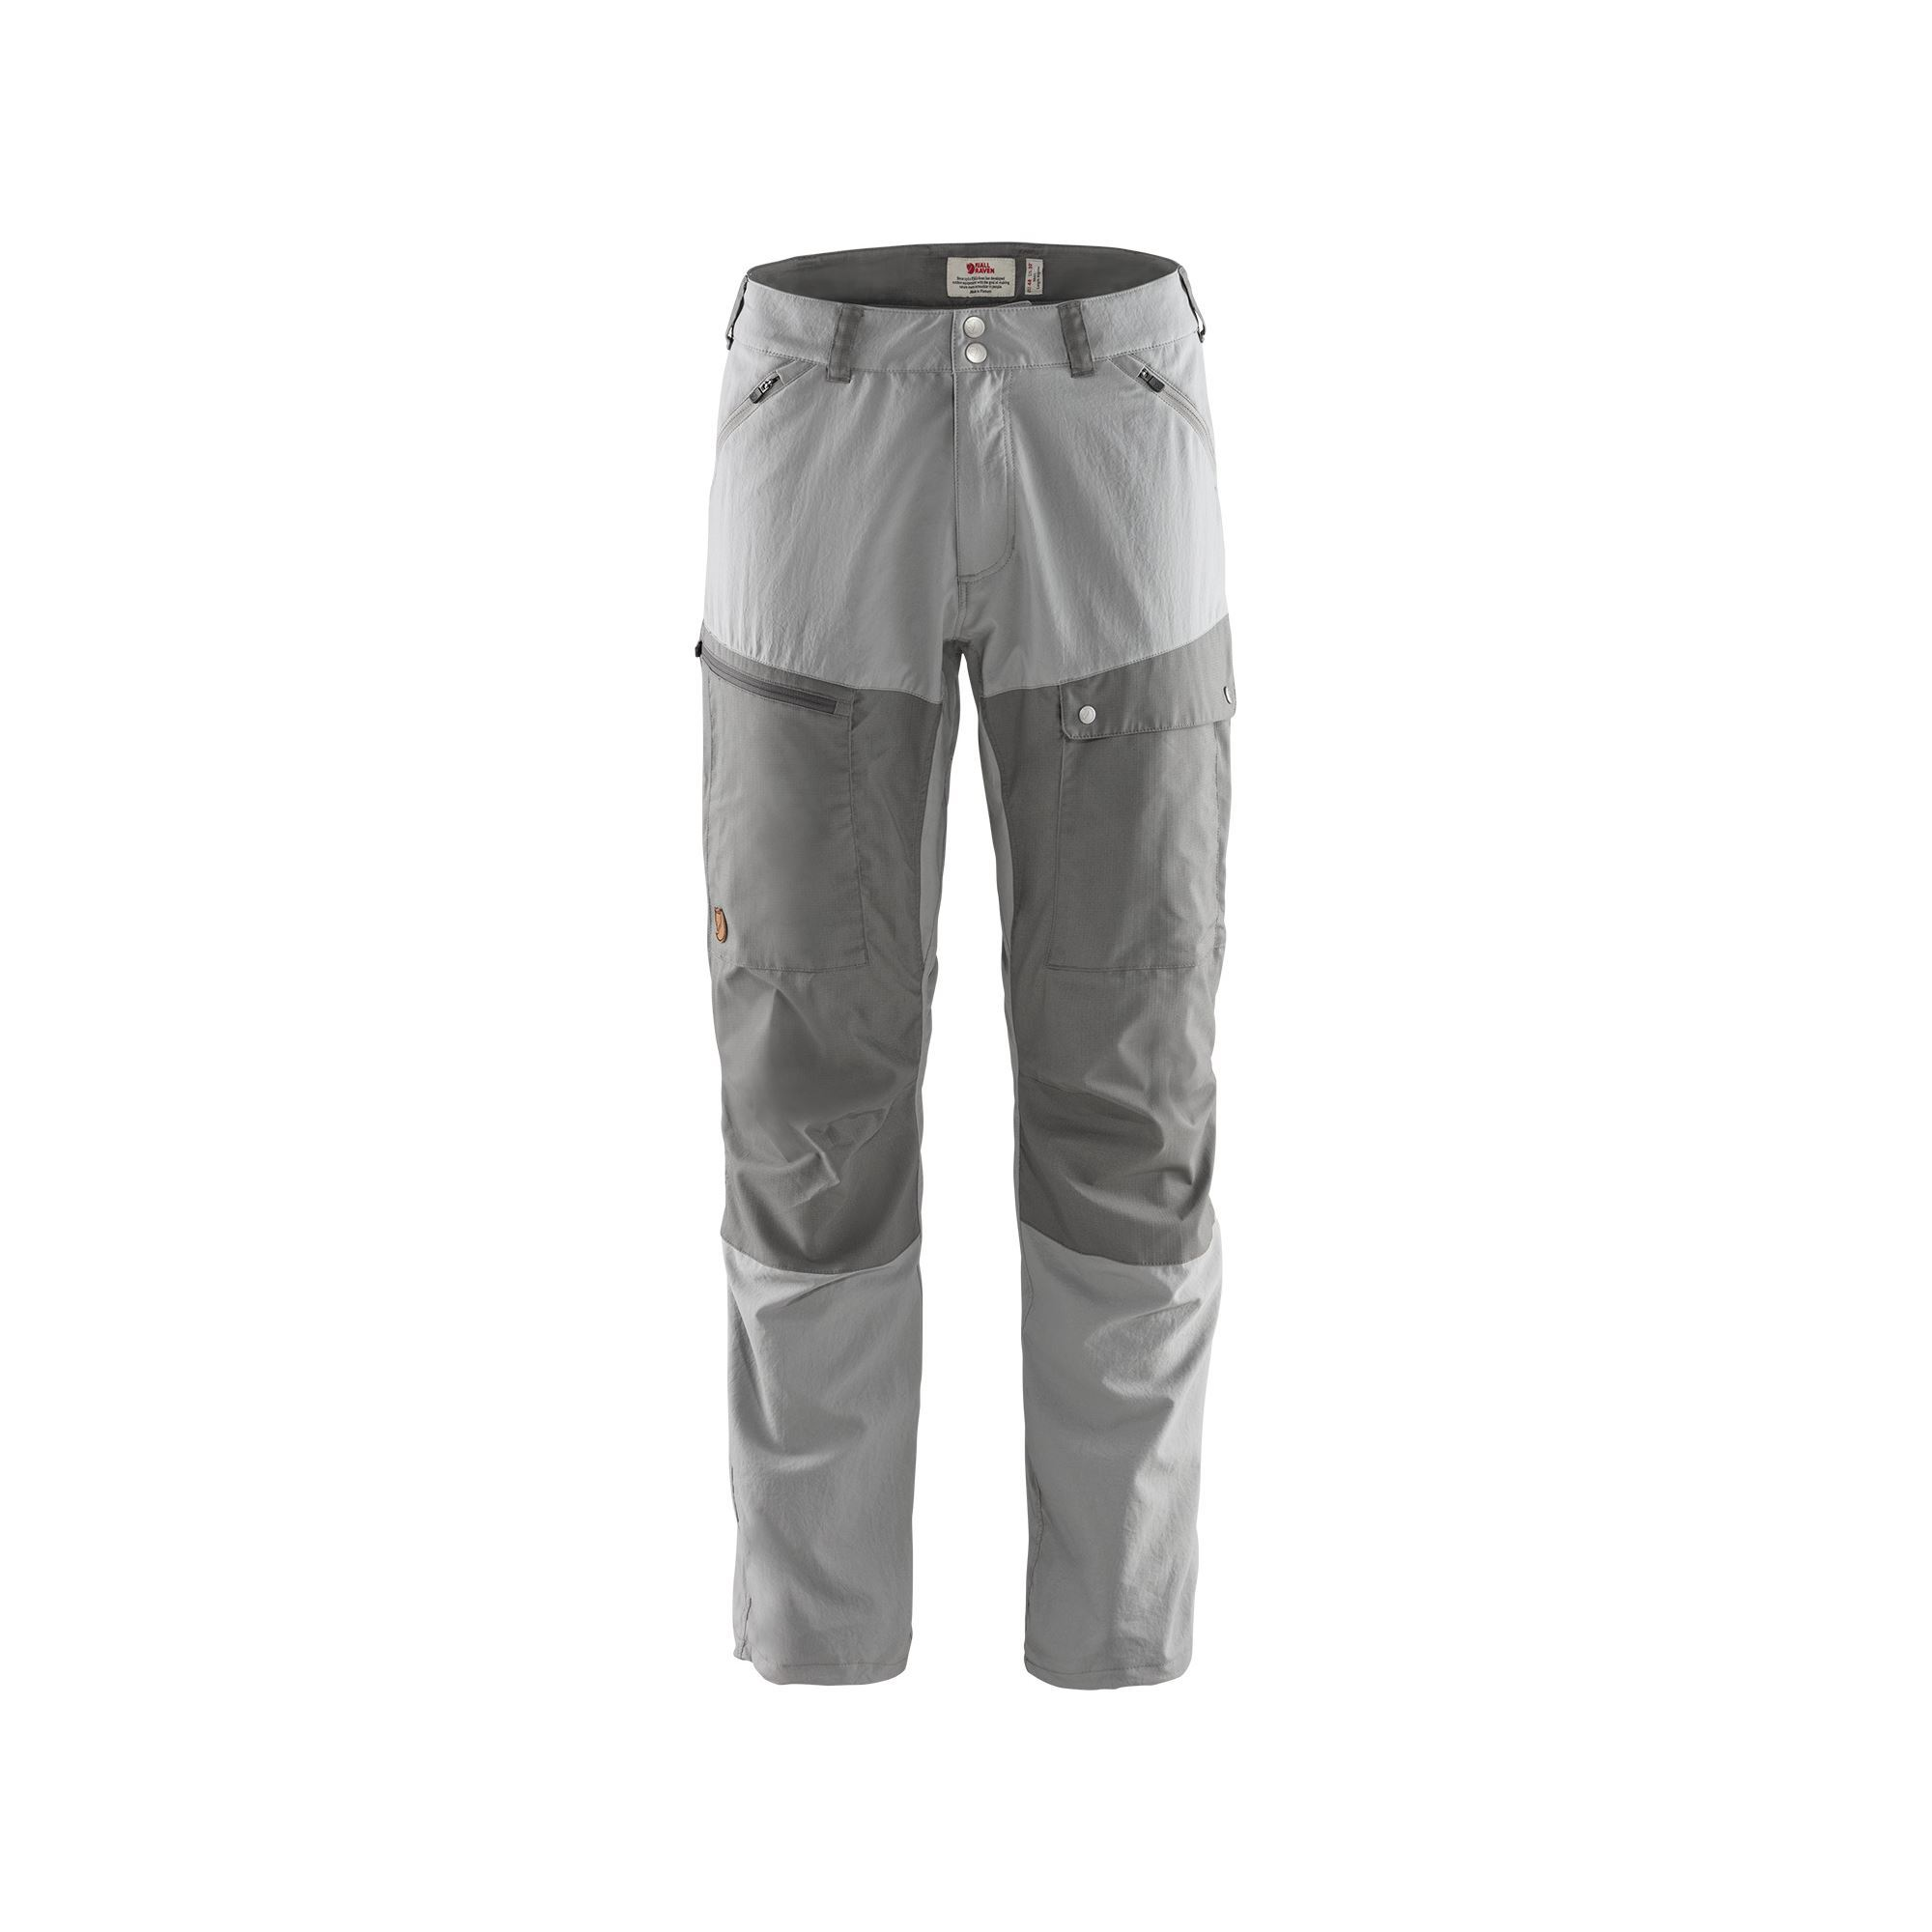 Abisko Midsummer Trousers Long - Men's